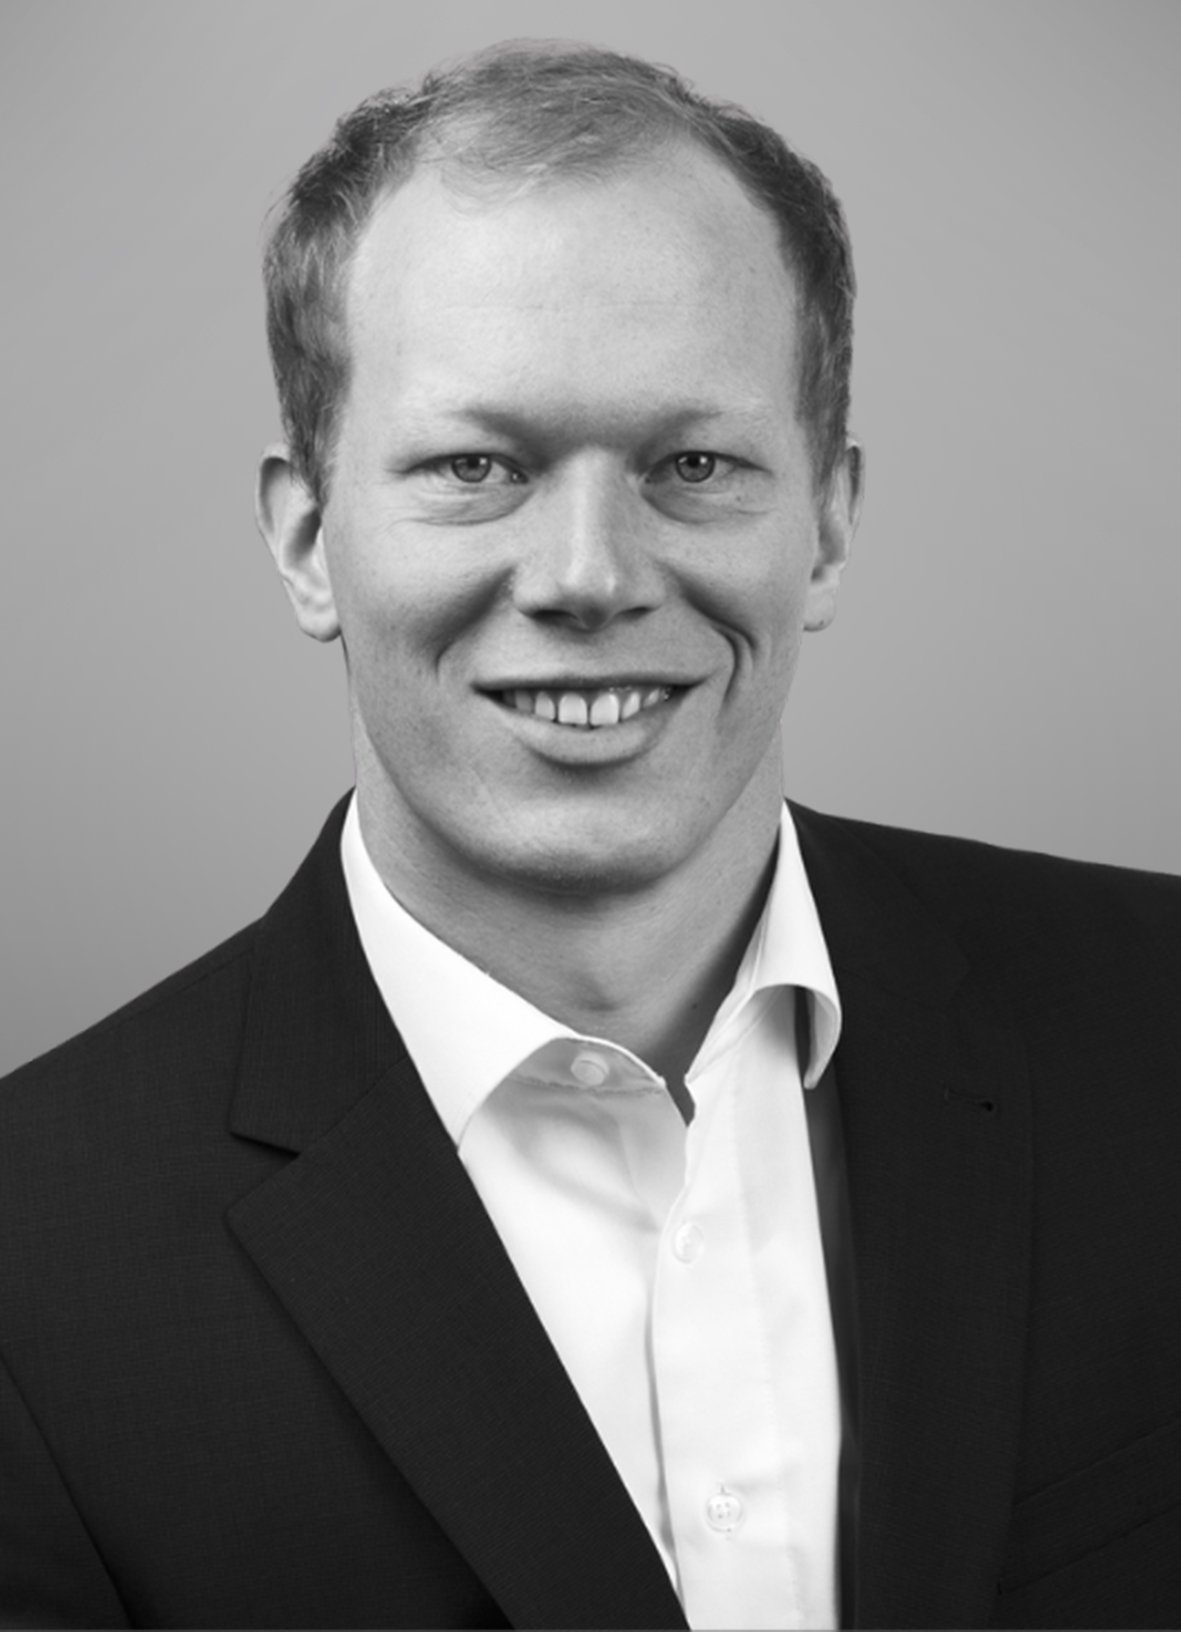 Dustin Schönrock